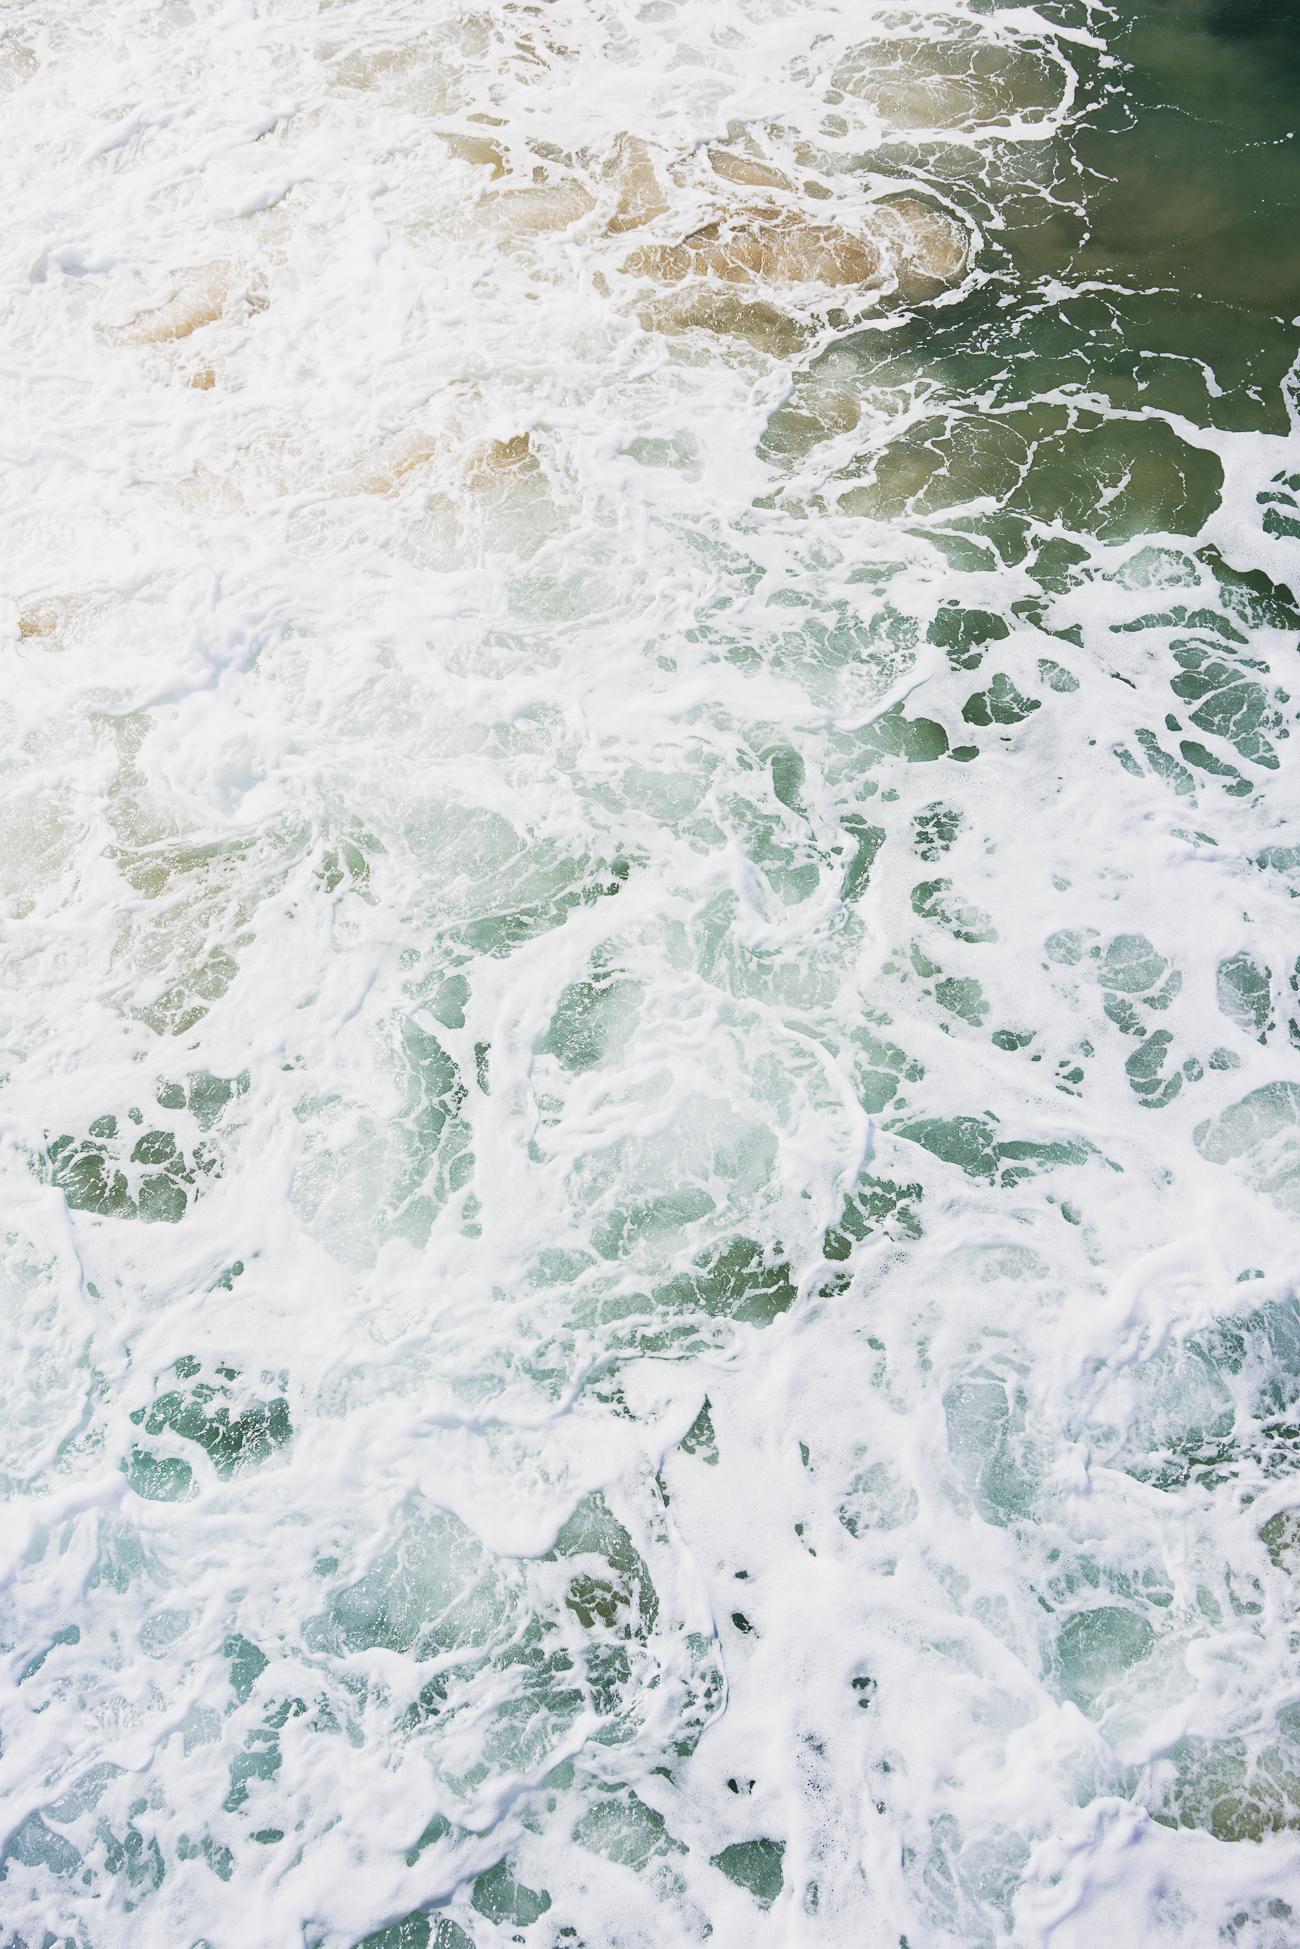 Manhattan Beach Waves / See & Savour